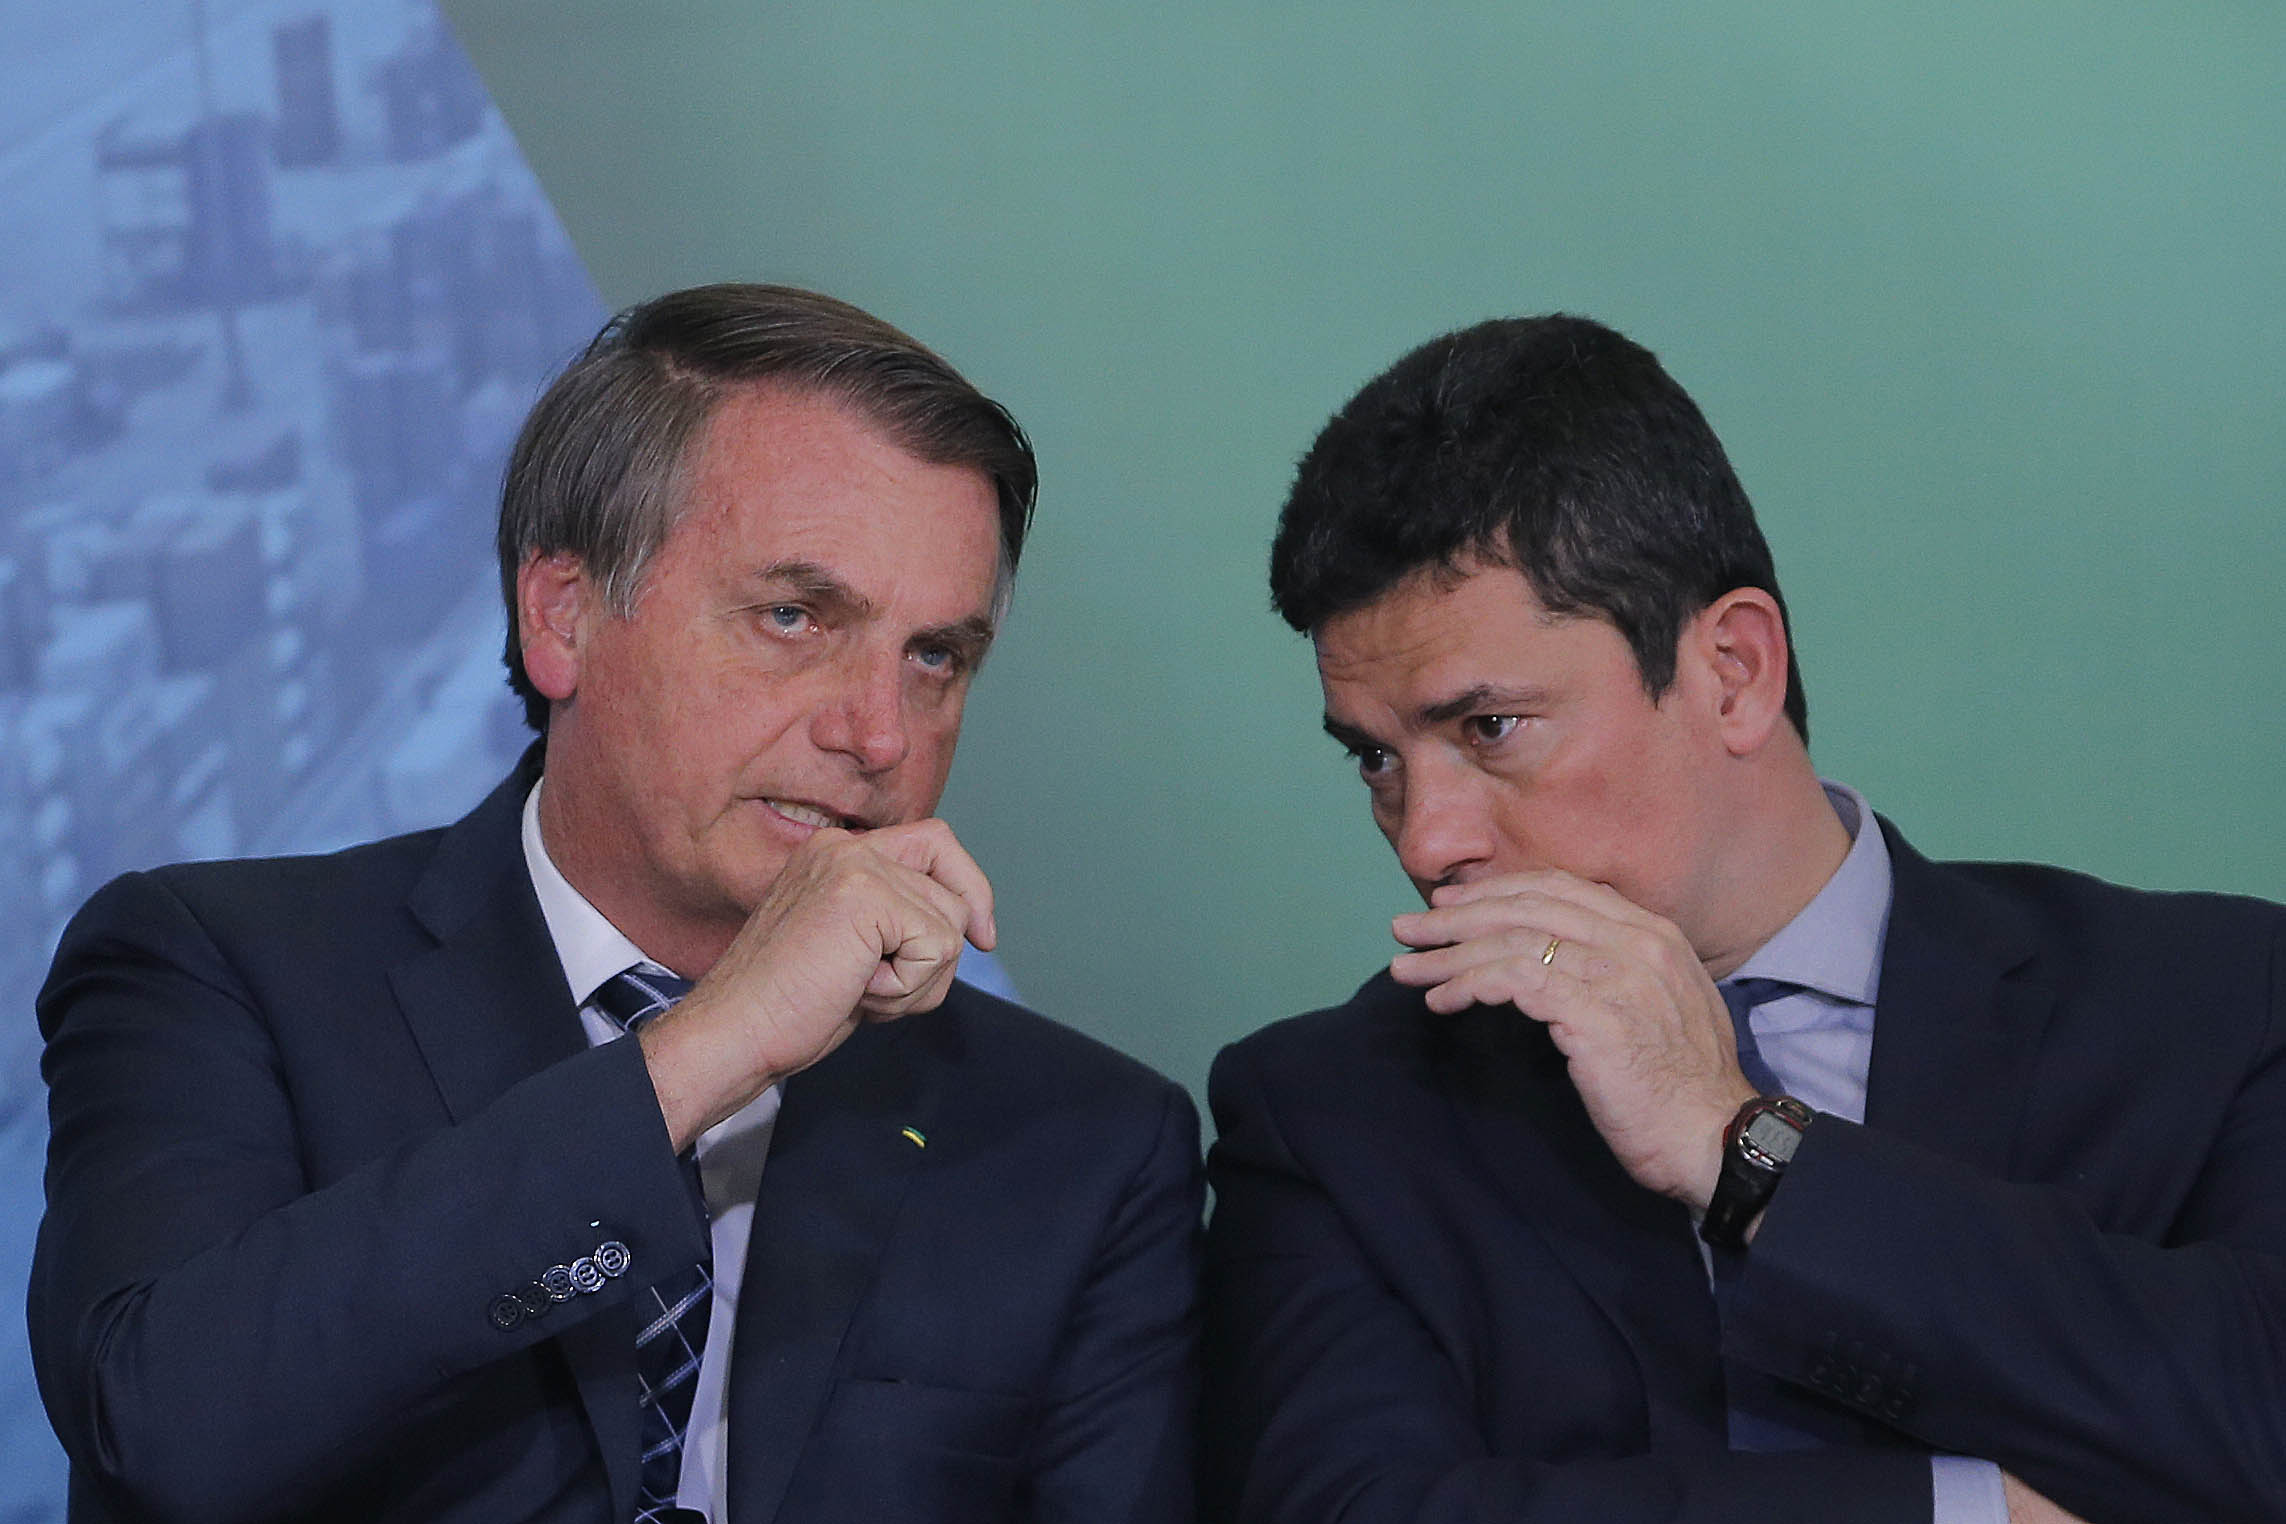 MORO PEDE DEMISSÃO; BOLSONARO RESISTE A ACEITAR